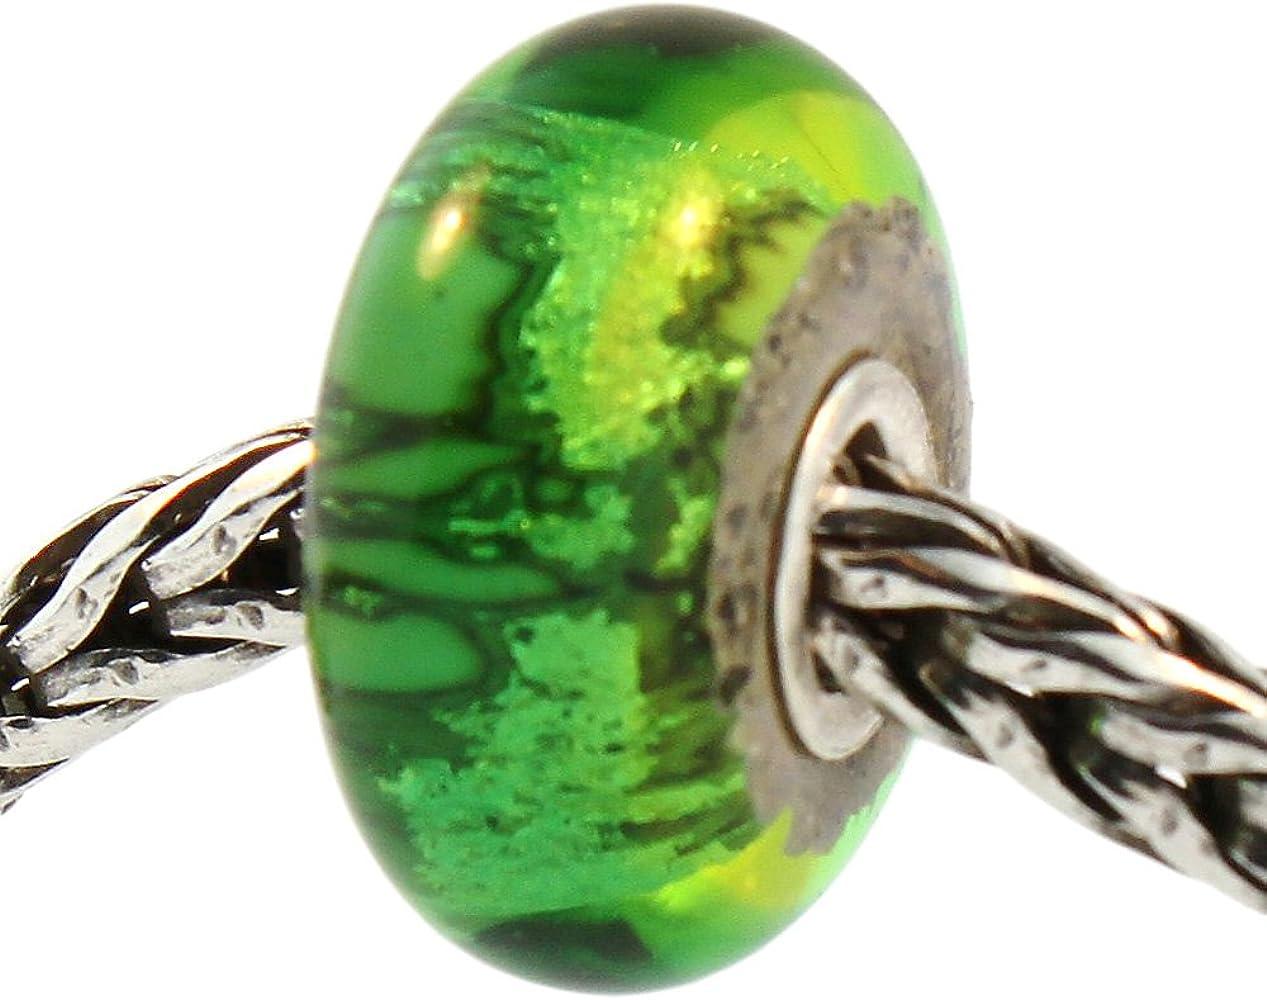 AUTHENTIC TROLLBEADS 62021 Green Flower Mosaic Glass Bead